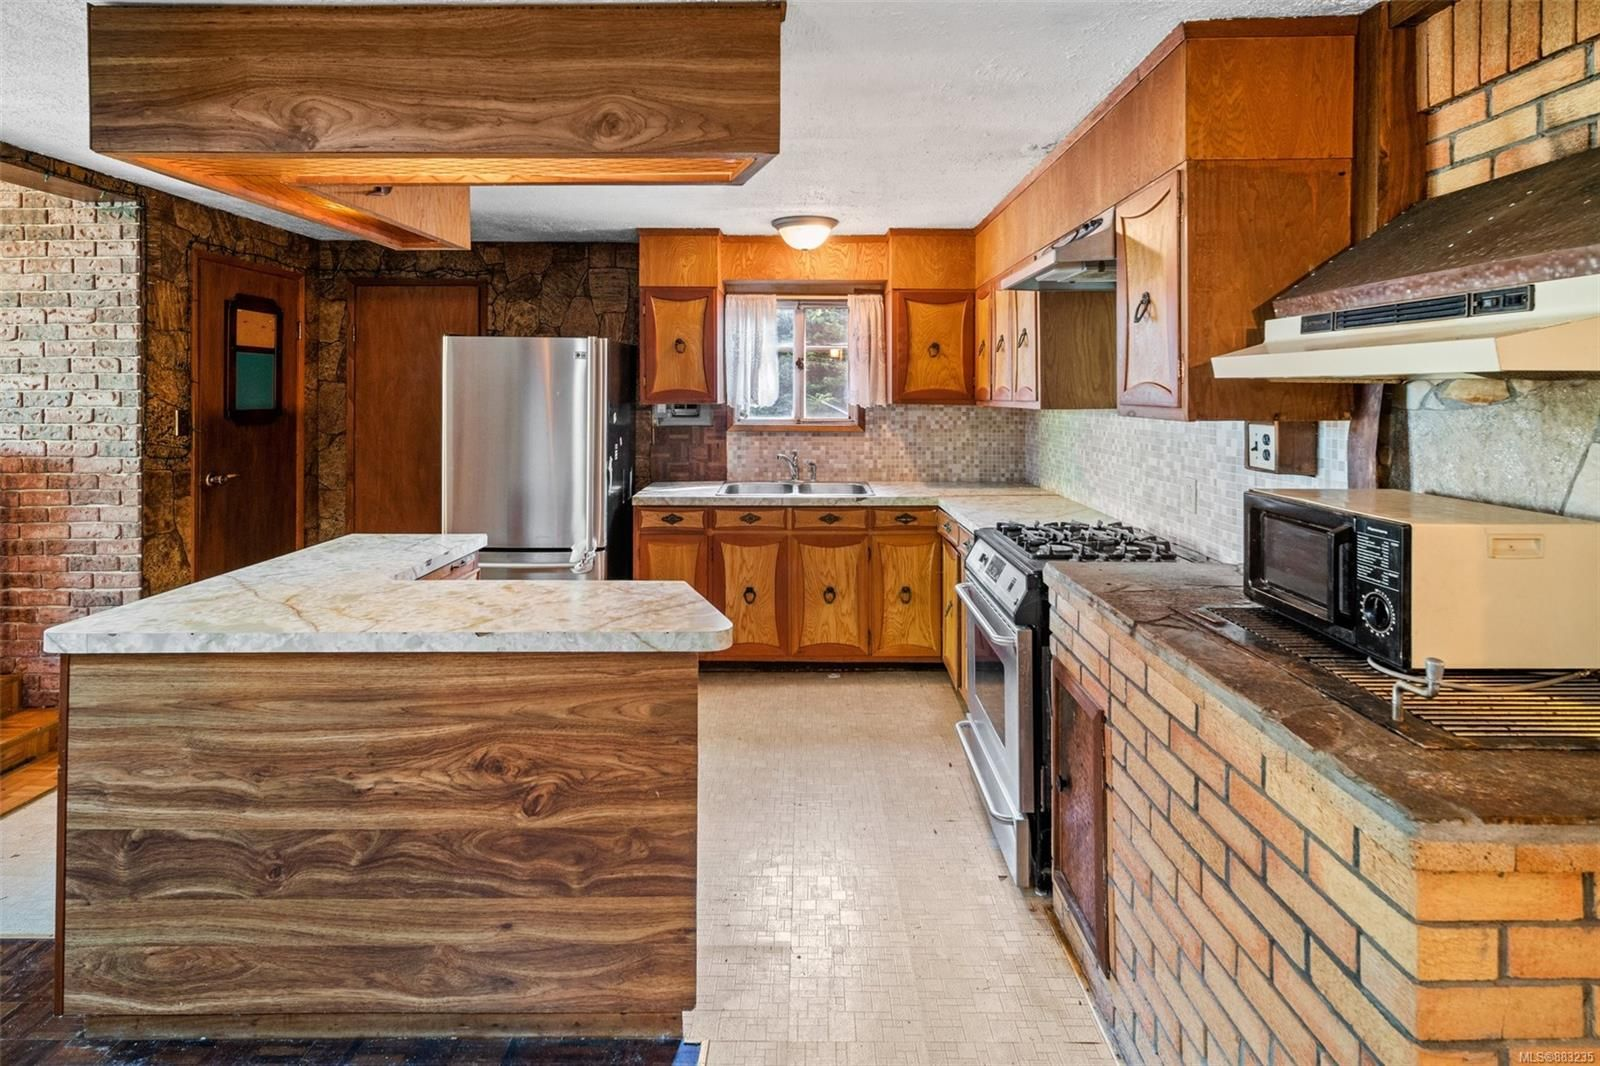 Photo 16: Photos: 6542 Thornett Rd in : Sk East Sooke House for sale (Sooke)  : MLS®# 883235